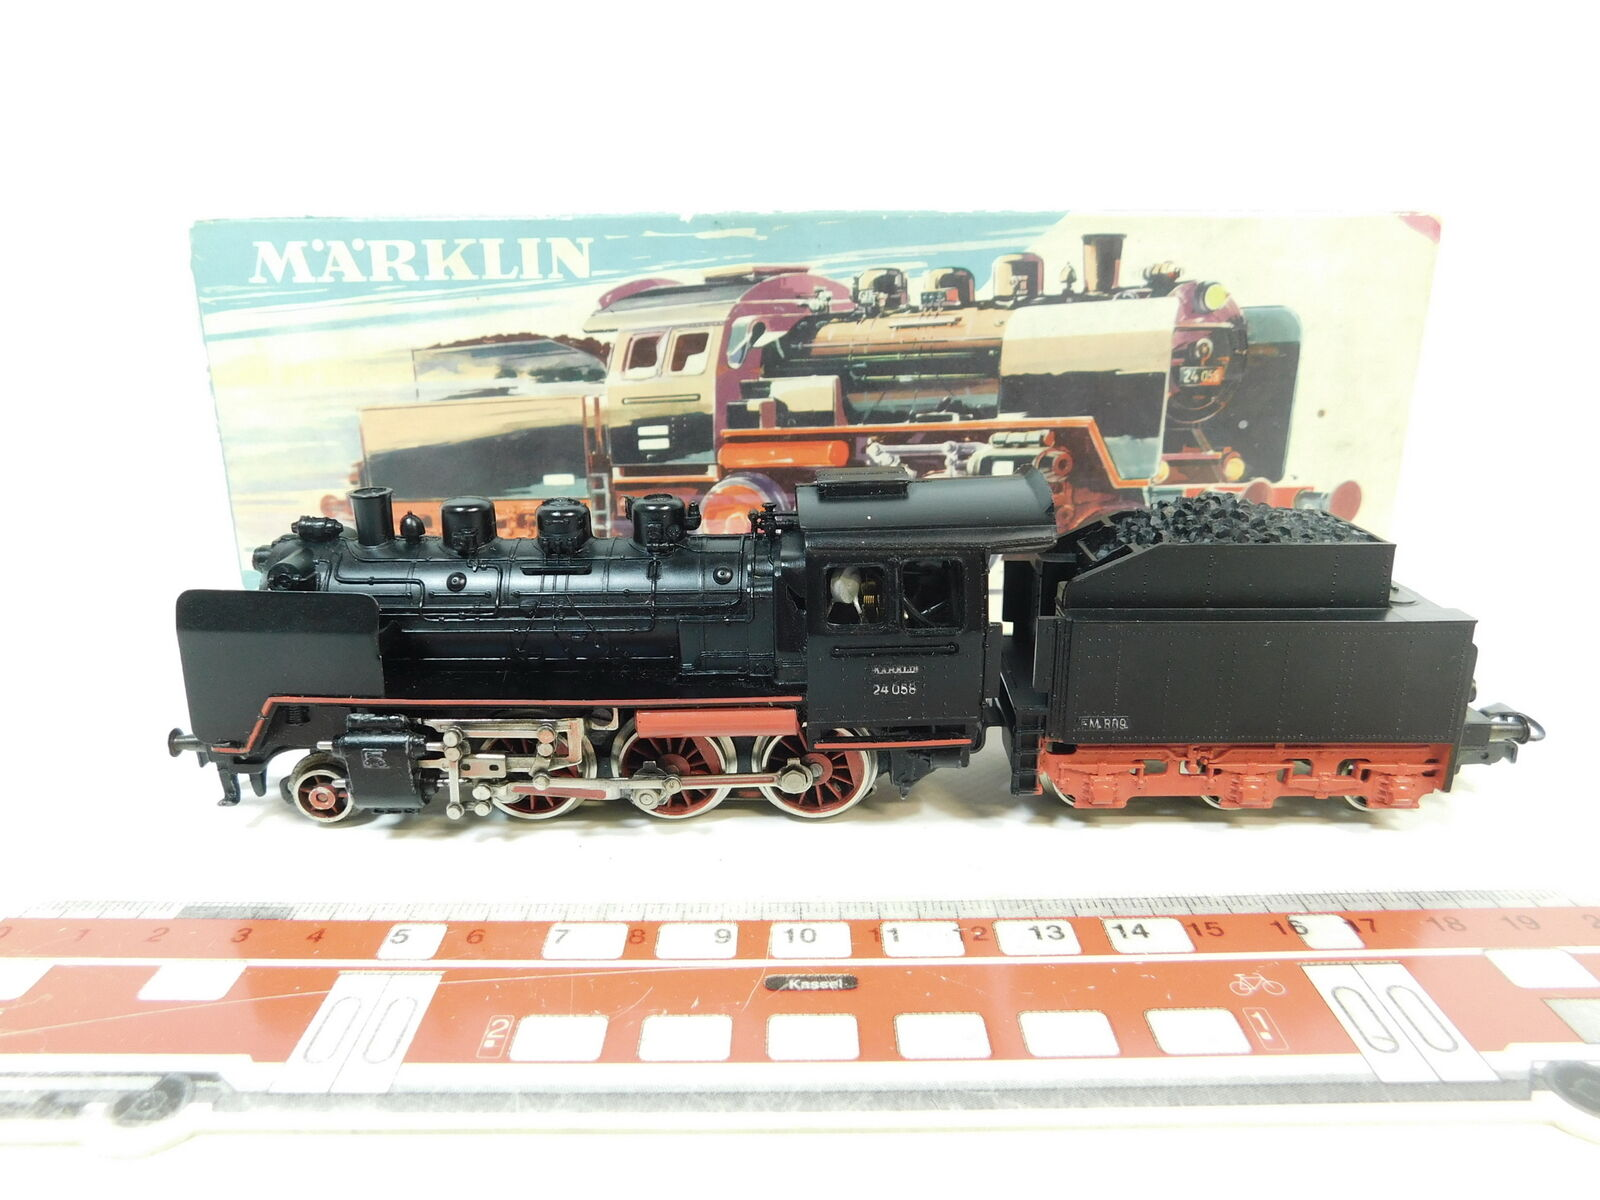 Bc740-1Märklin h0 ac 3003 Steam Locomotive Steam Locomotive 24 058 fm 809 DB, OVP